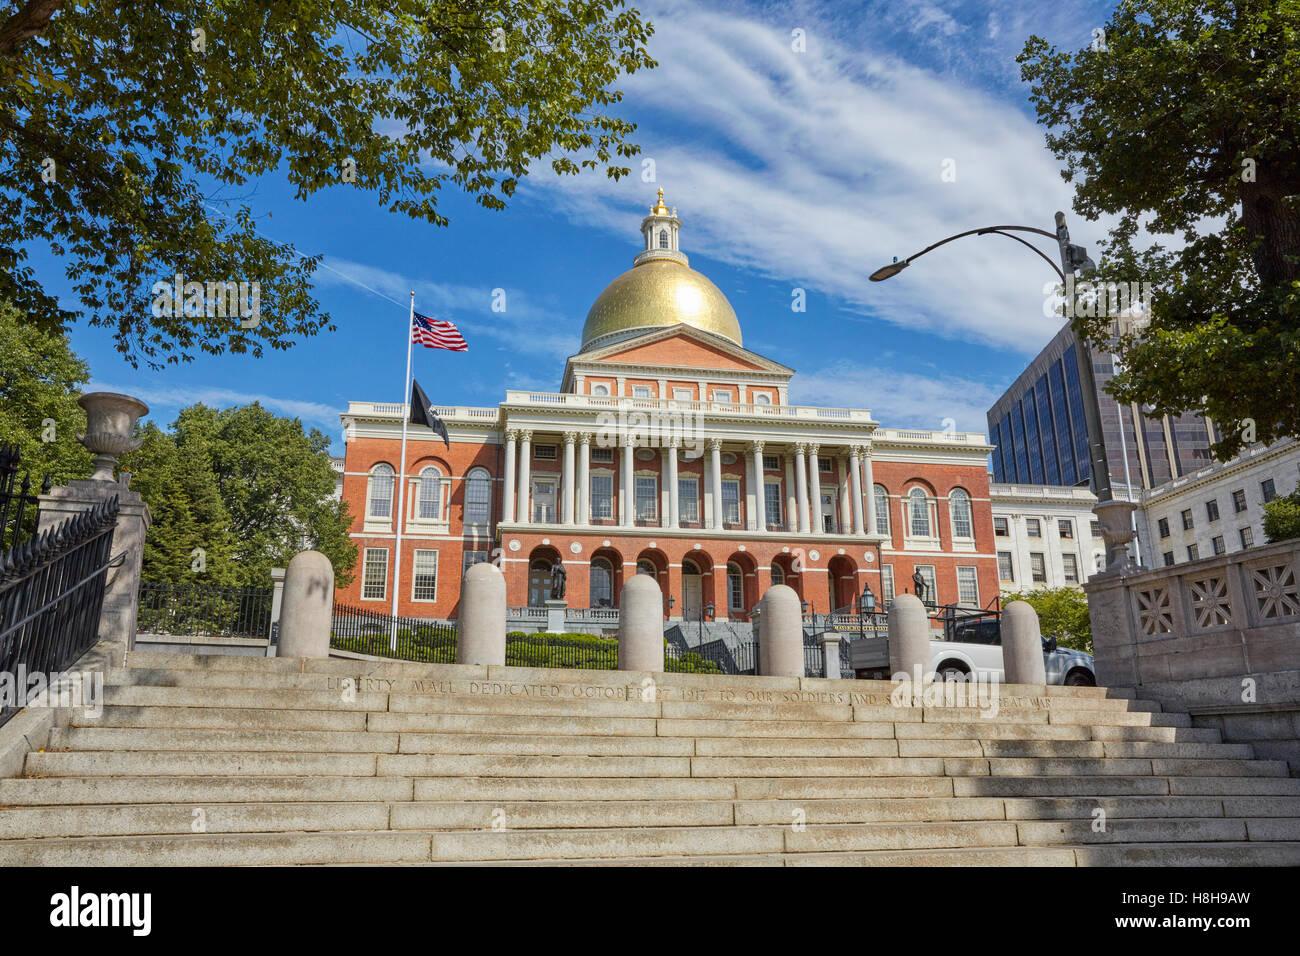 Casa del Estado de Massachusetts, Boston, Massachusetts, EE.UU. Imagen De Stock